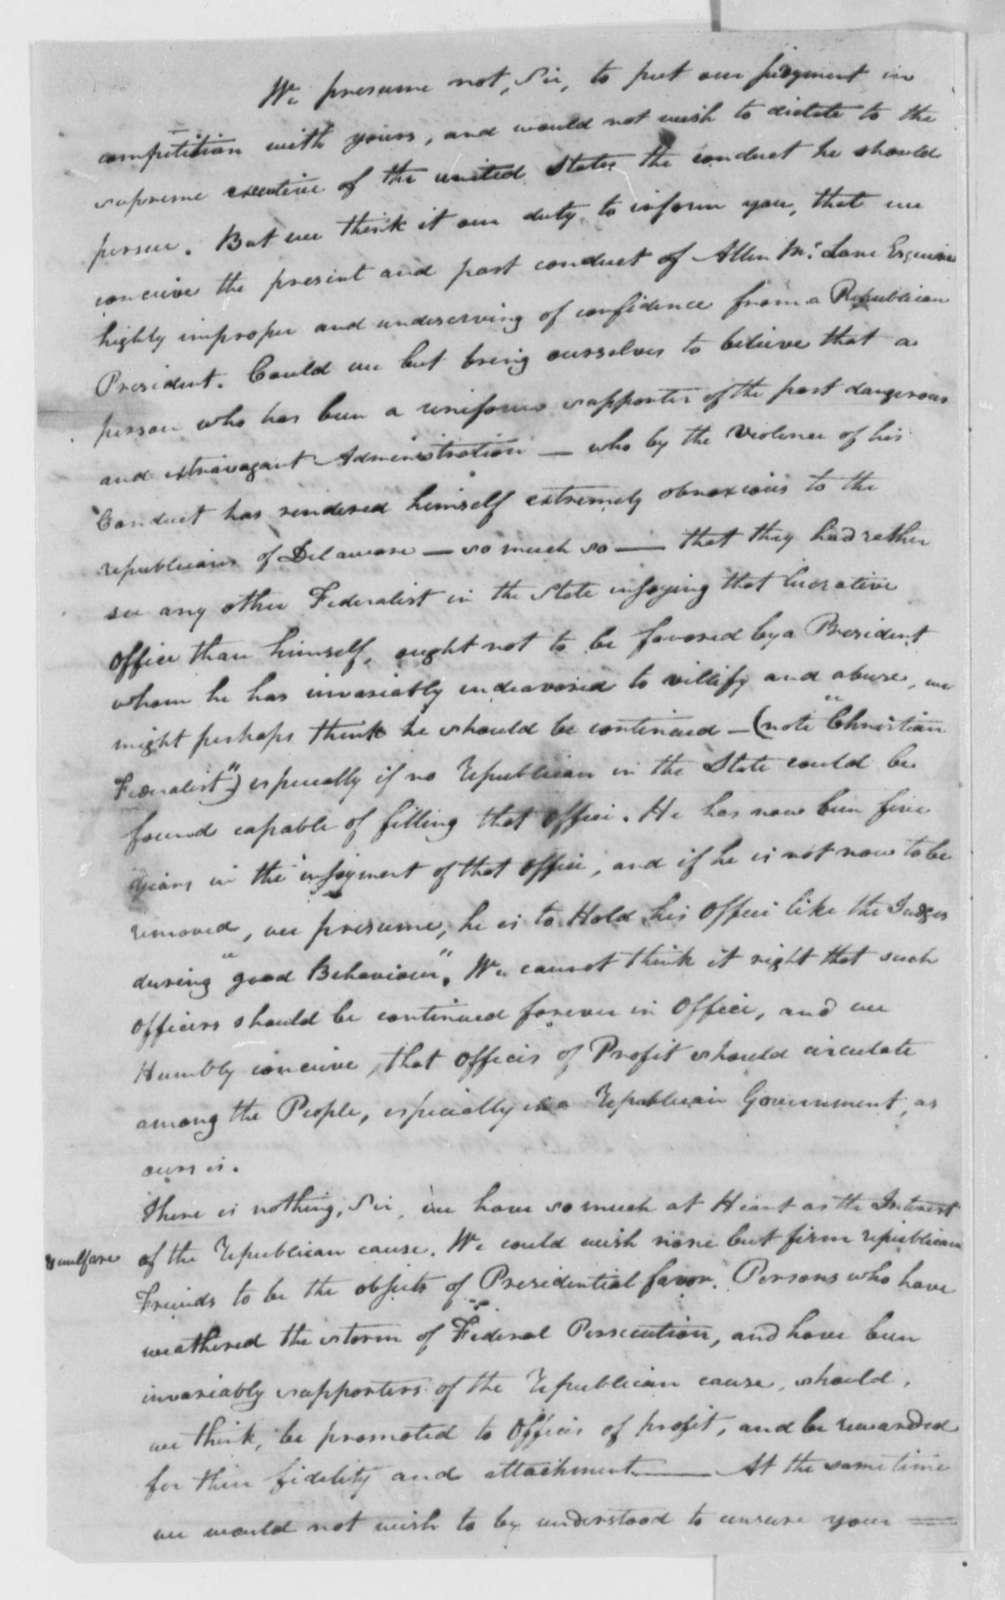 Delaware Democratic Republicans to Thomas Jefferson, March 24, 1802, Resolution